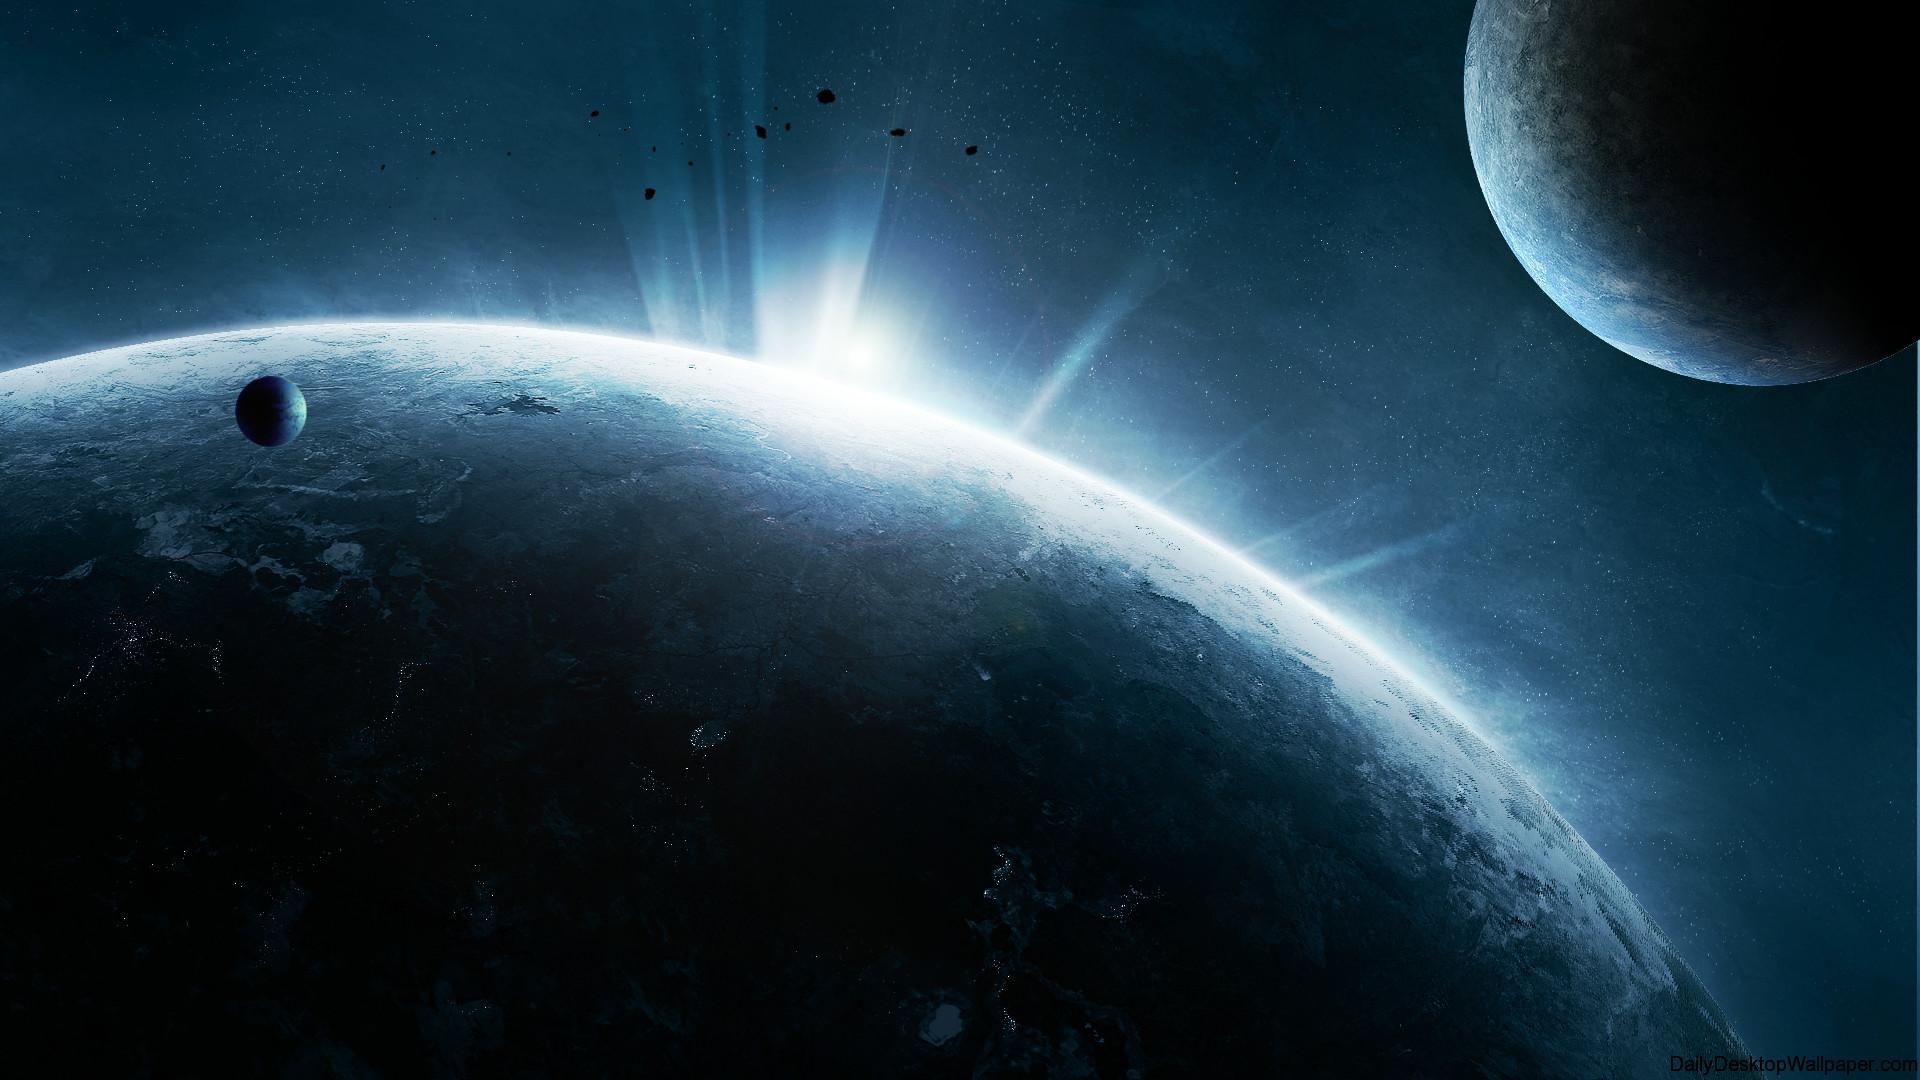 Download 'deep space wallpaper' HD wallpaper